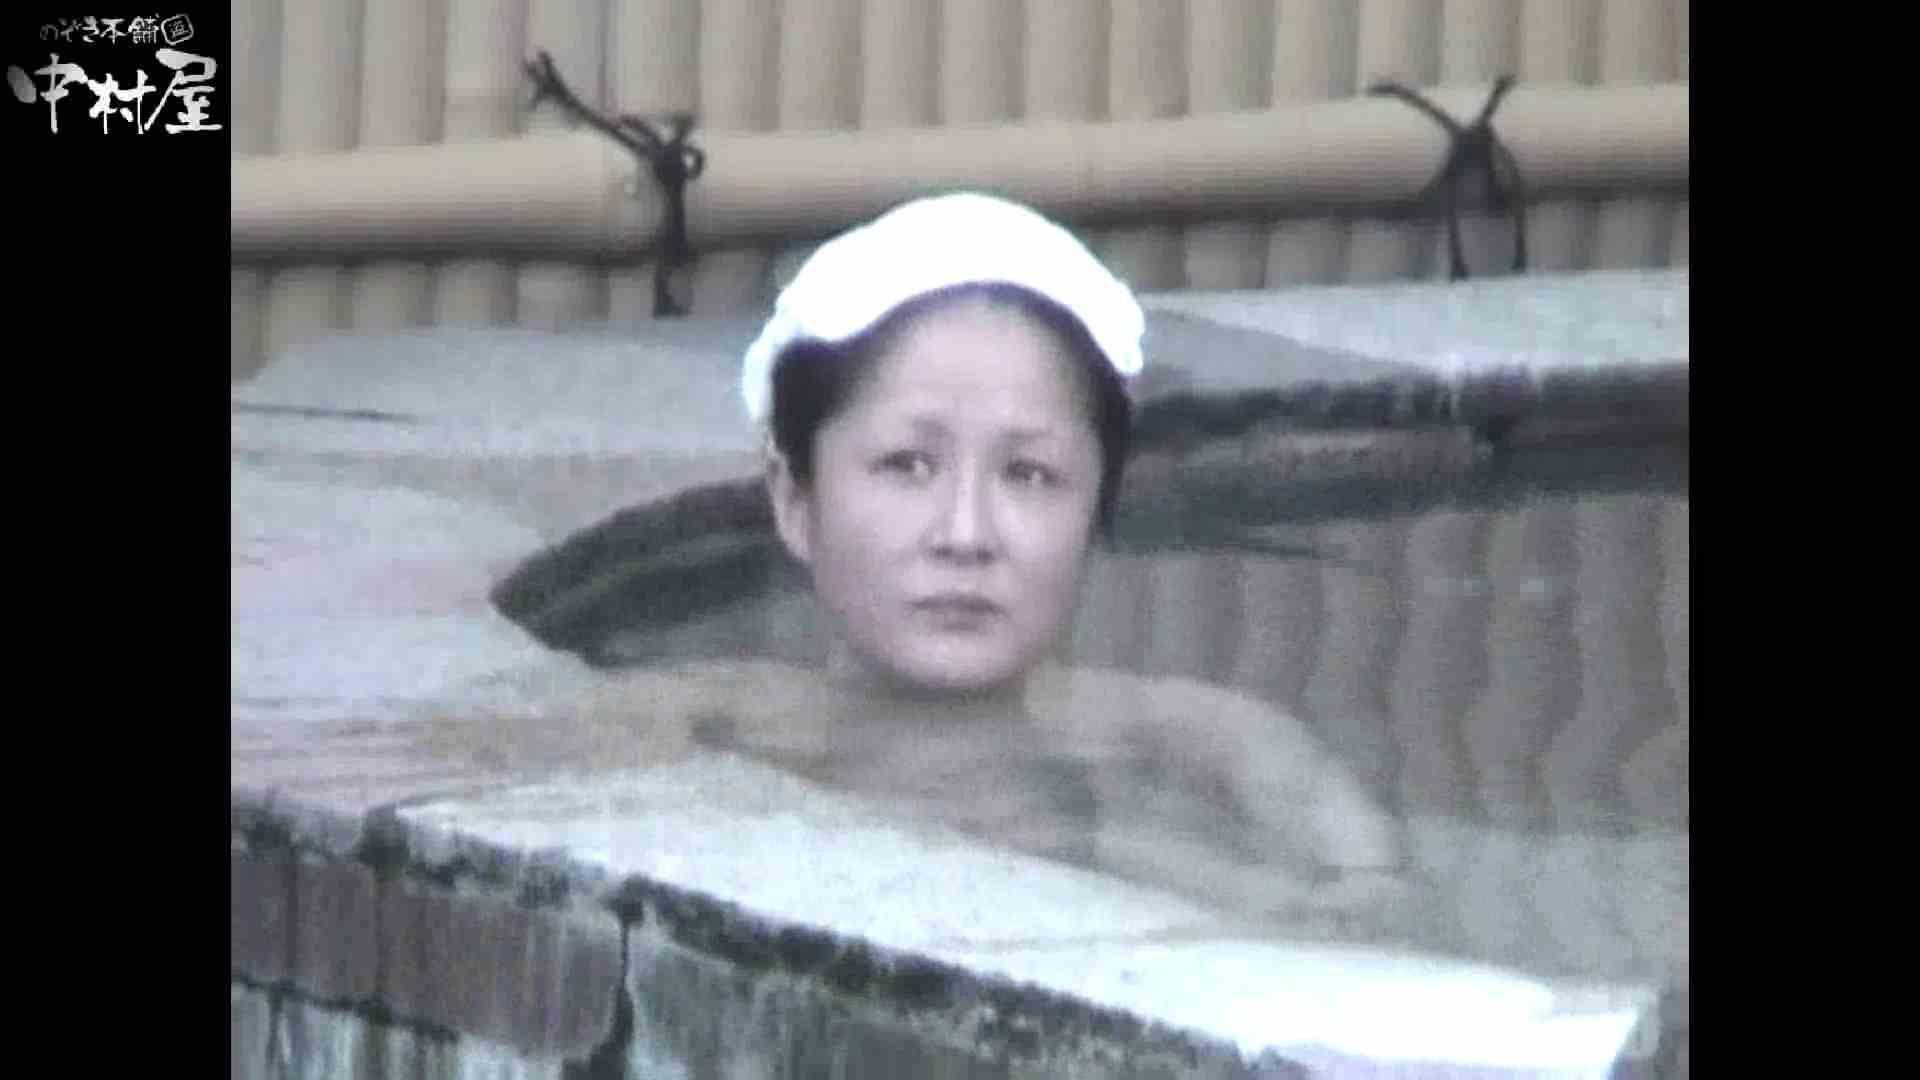 Aquaな露天風呂Vol.880潜入盗撮露天風呂十六判湯 其の六 露天 | 潜入シリーズ  95pic 69